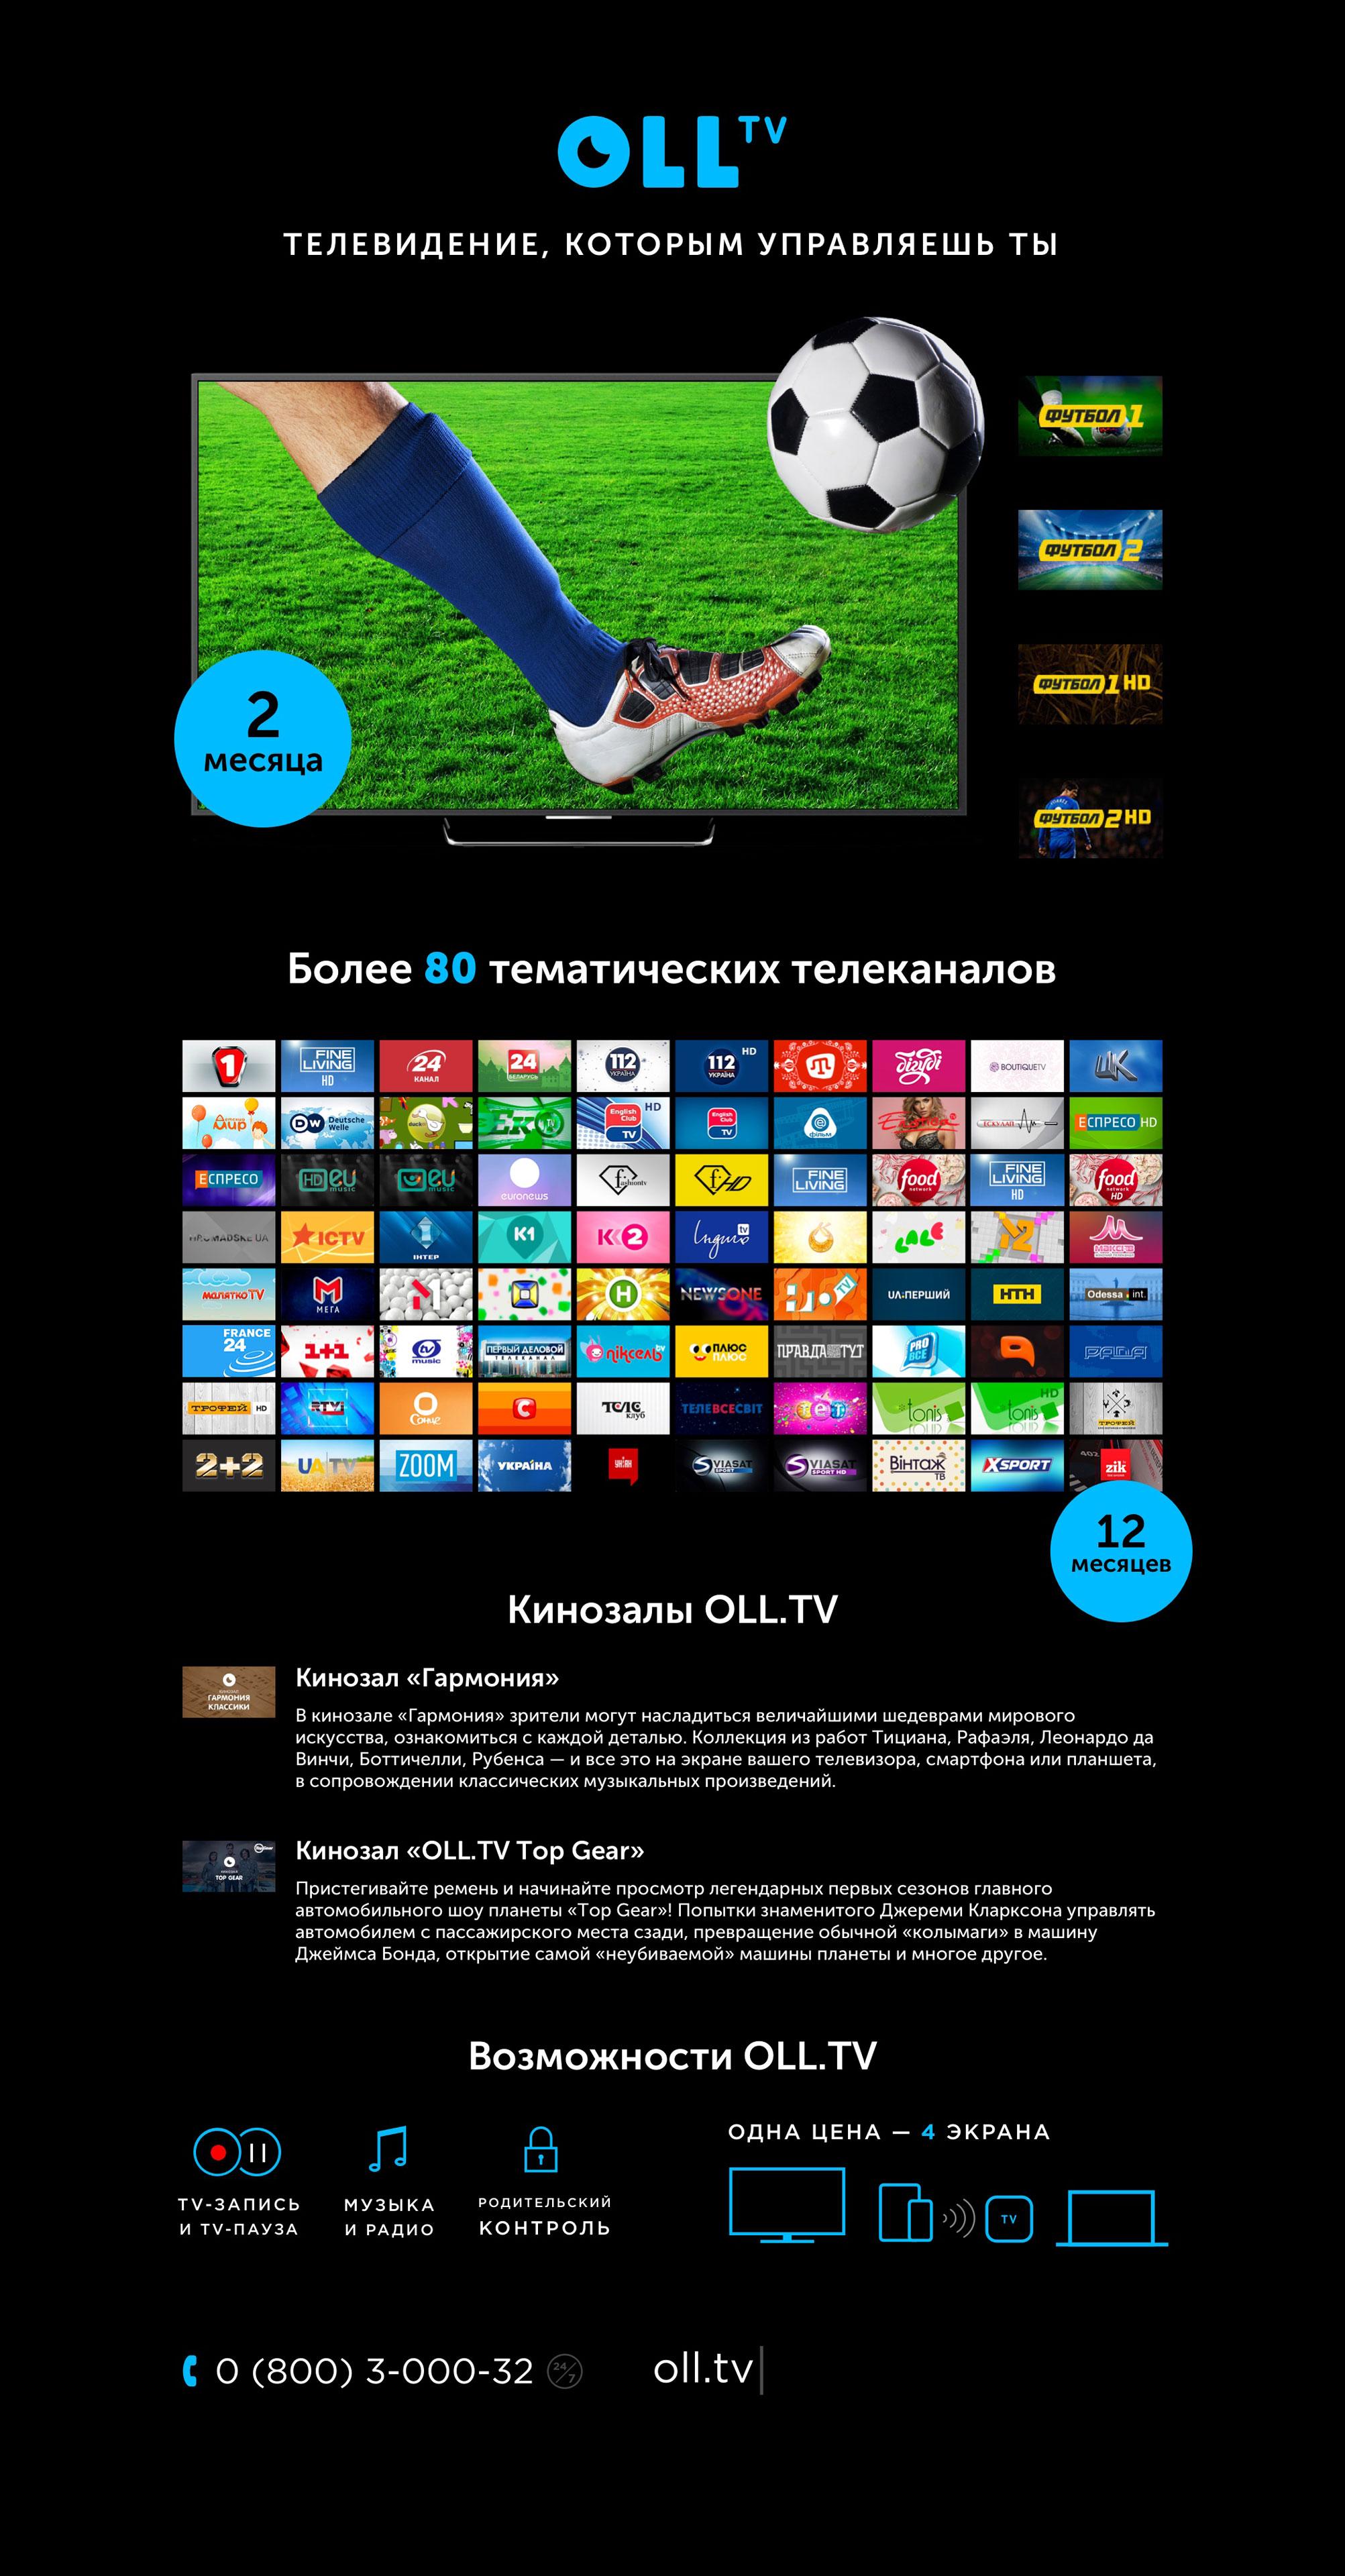 Пакет футбол hd футбол 1hd, 2hd, 3hd. ᐉ Akcionnyj Paket Oll Tv 12 Mesyacev Kupit V Kieve Ukraine Luchshaya Cena V Epicentre